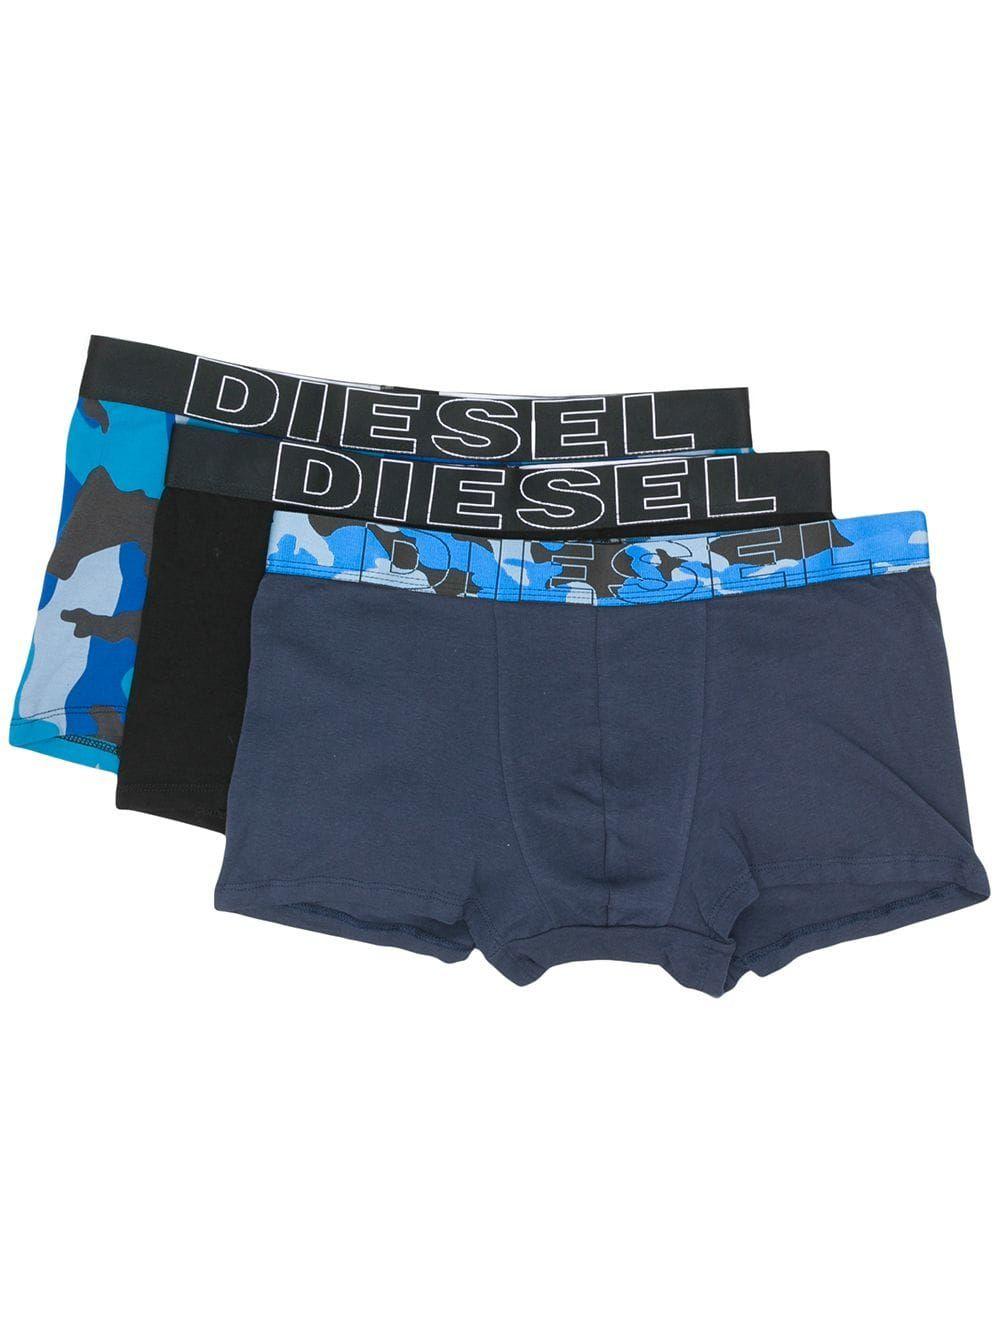 DIESEL Mens 3-Pack Brief UMBR-Andre Green Camouflage Print Black